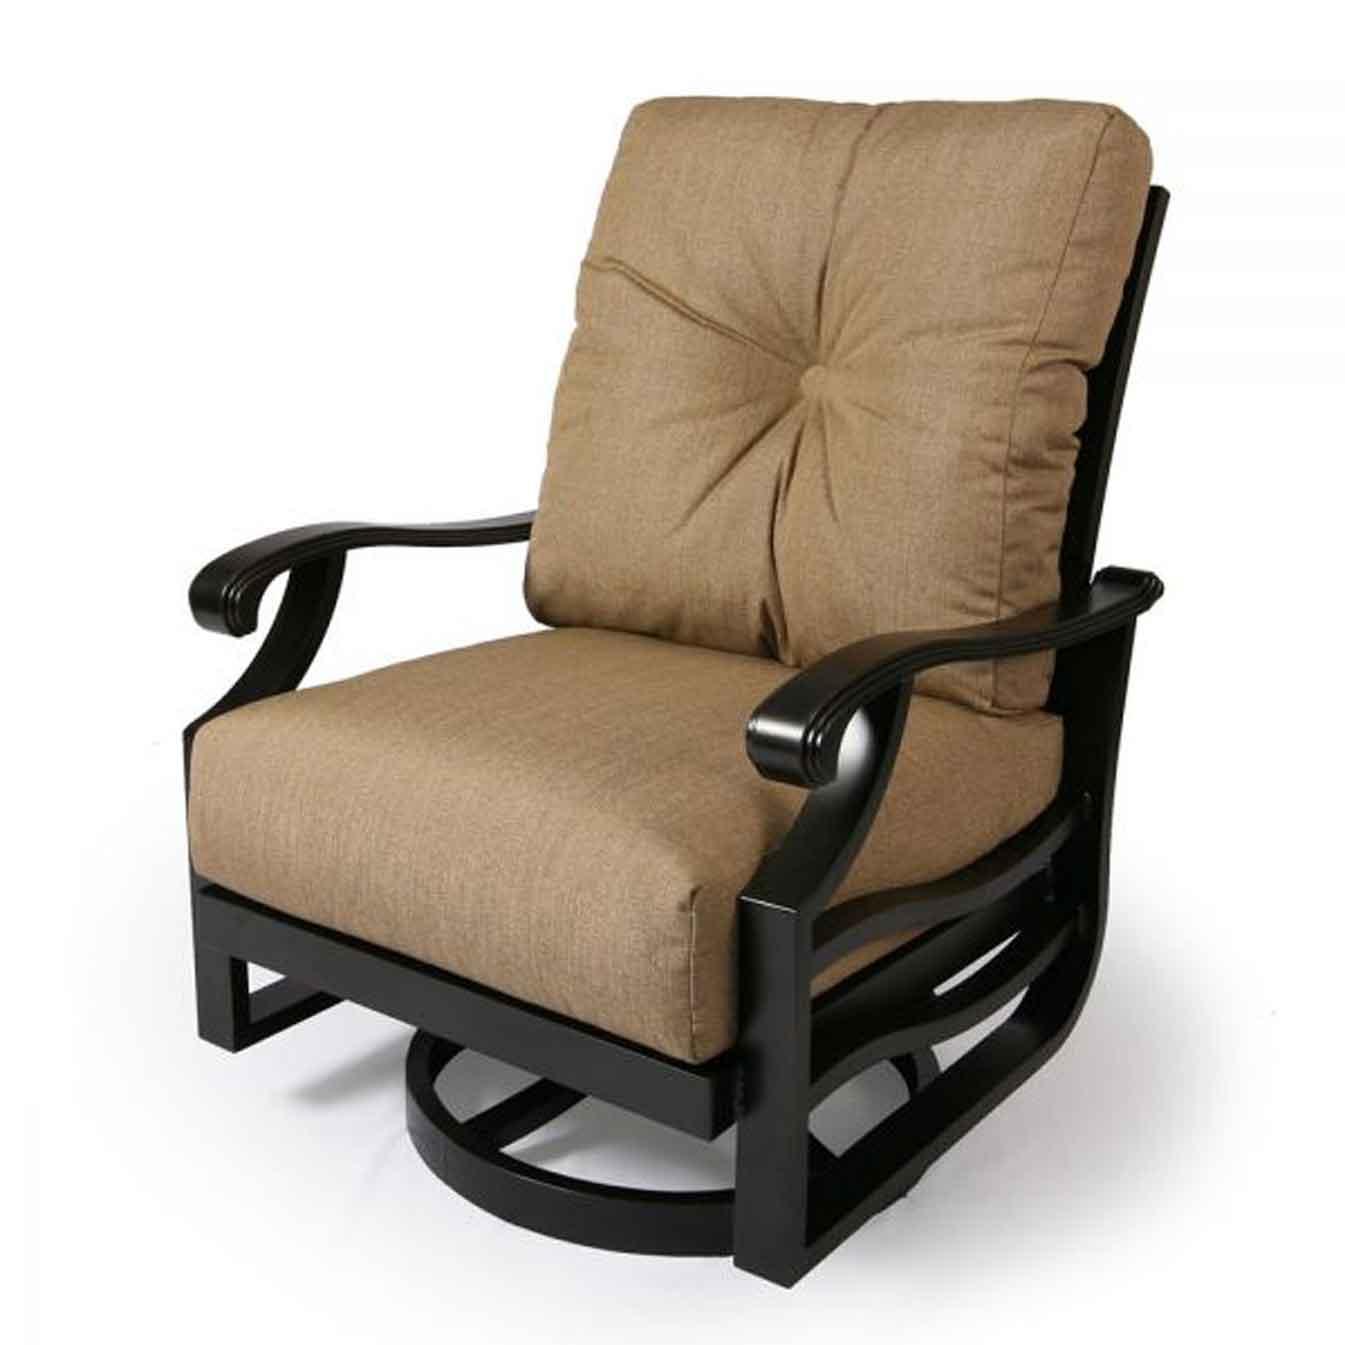 Anthem Cushion Swivel Club Chair - Rochelle